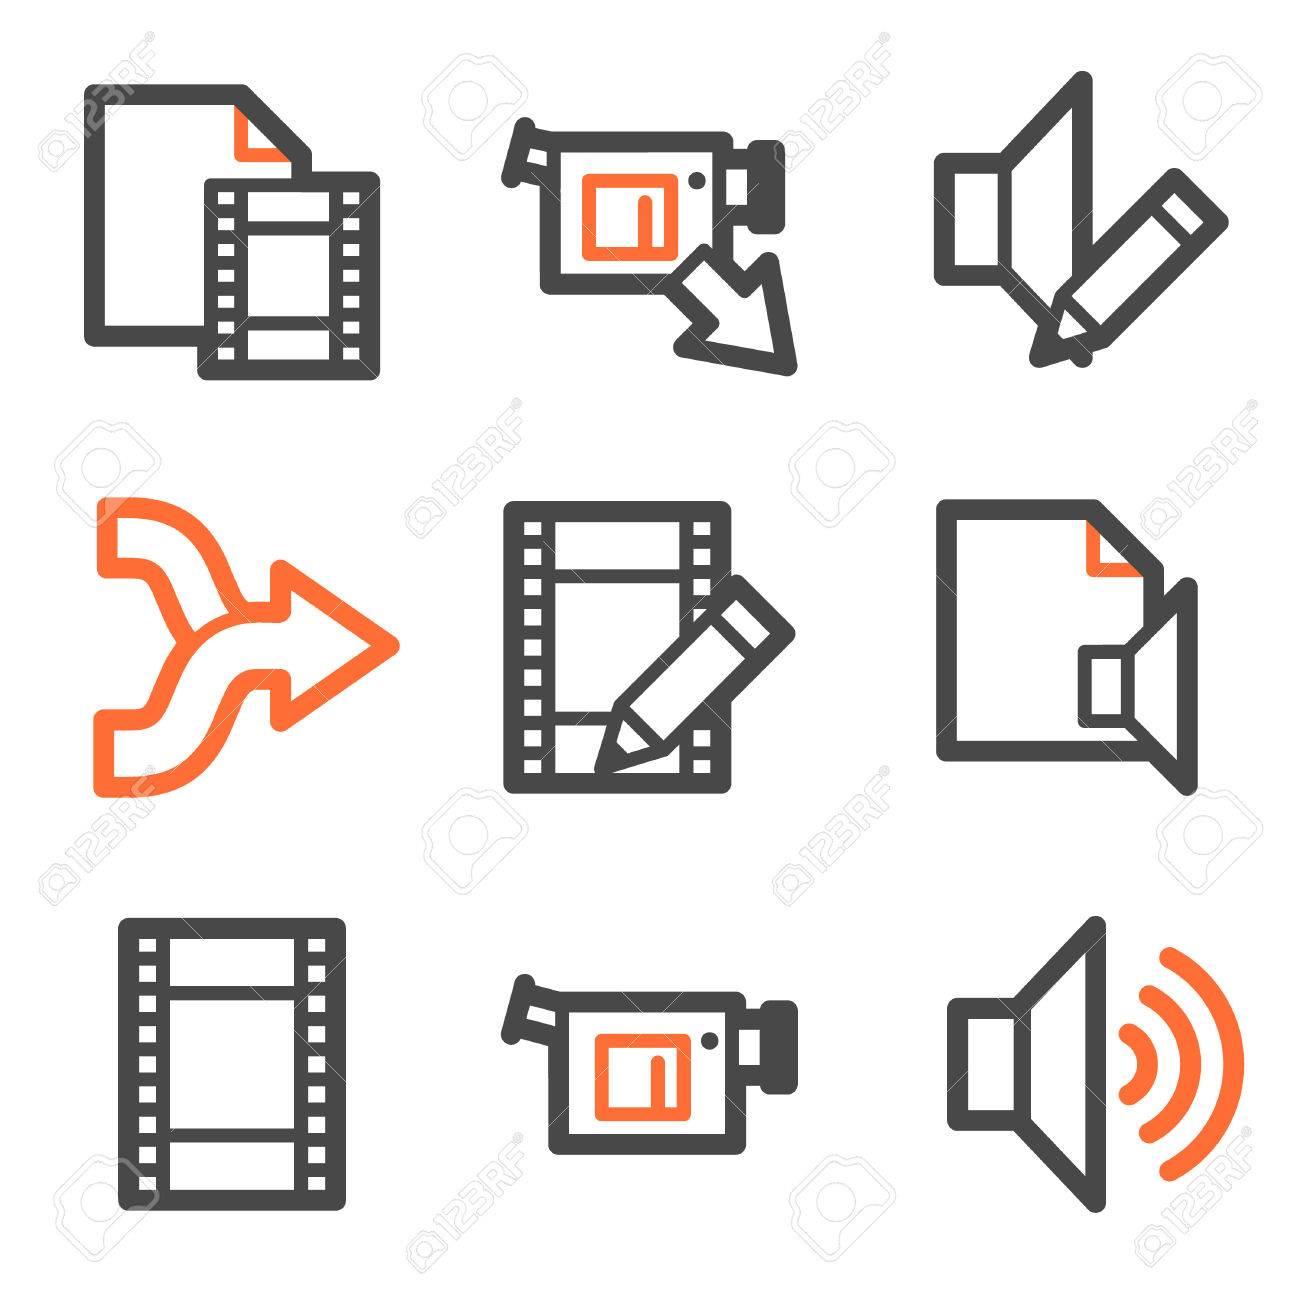 Audio video edit web icons orange and gray contour series royalty audio video edit web icons orange and gray contour series stock vector 5042194 ccuart Images